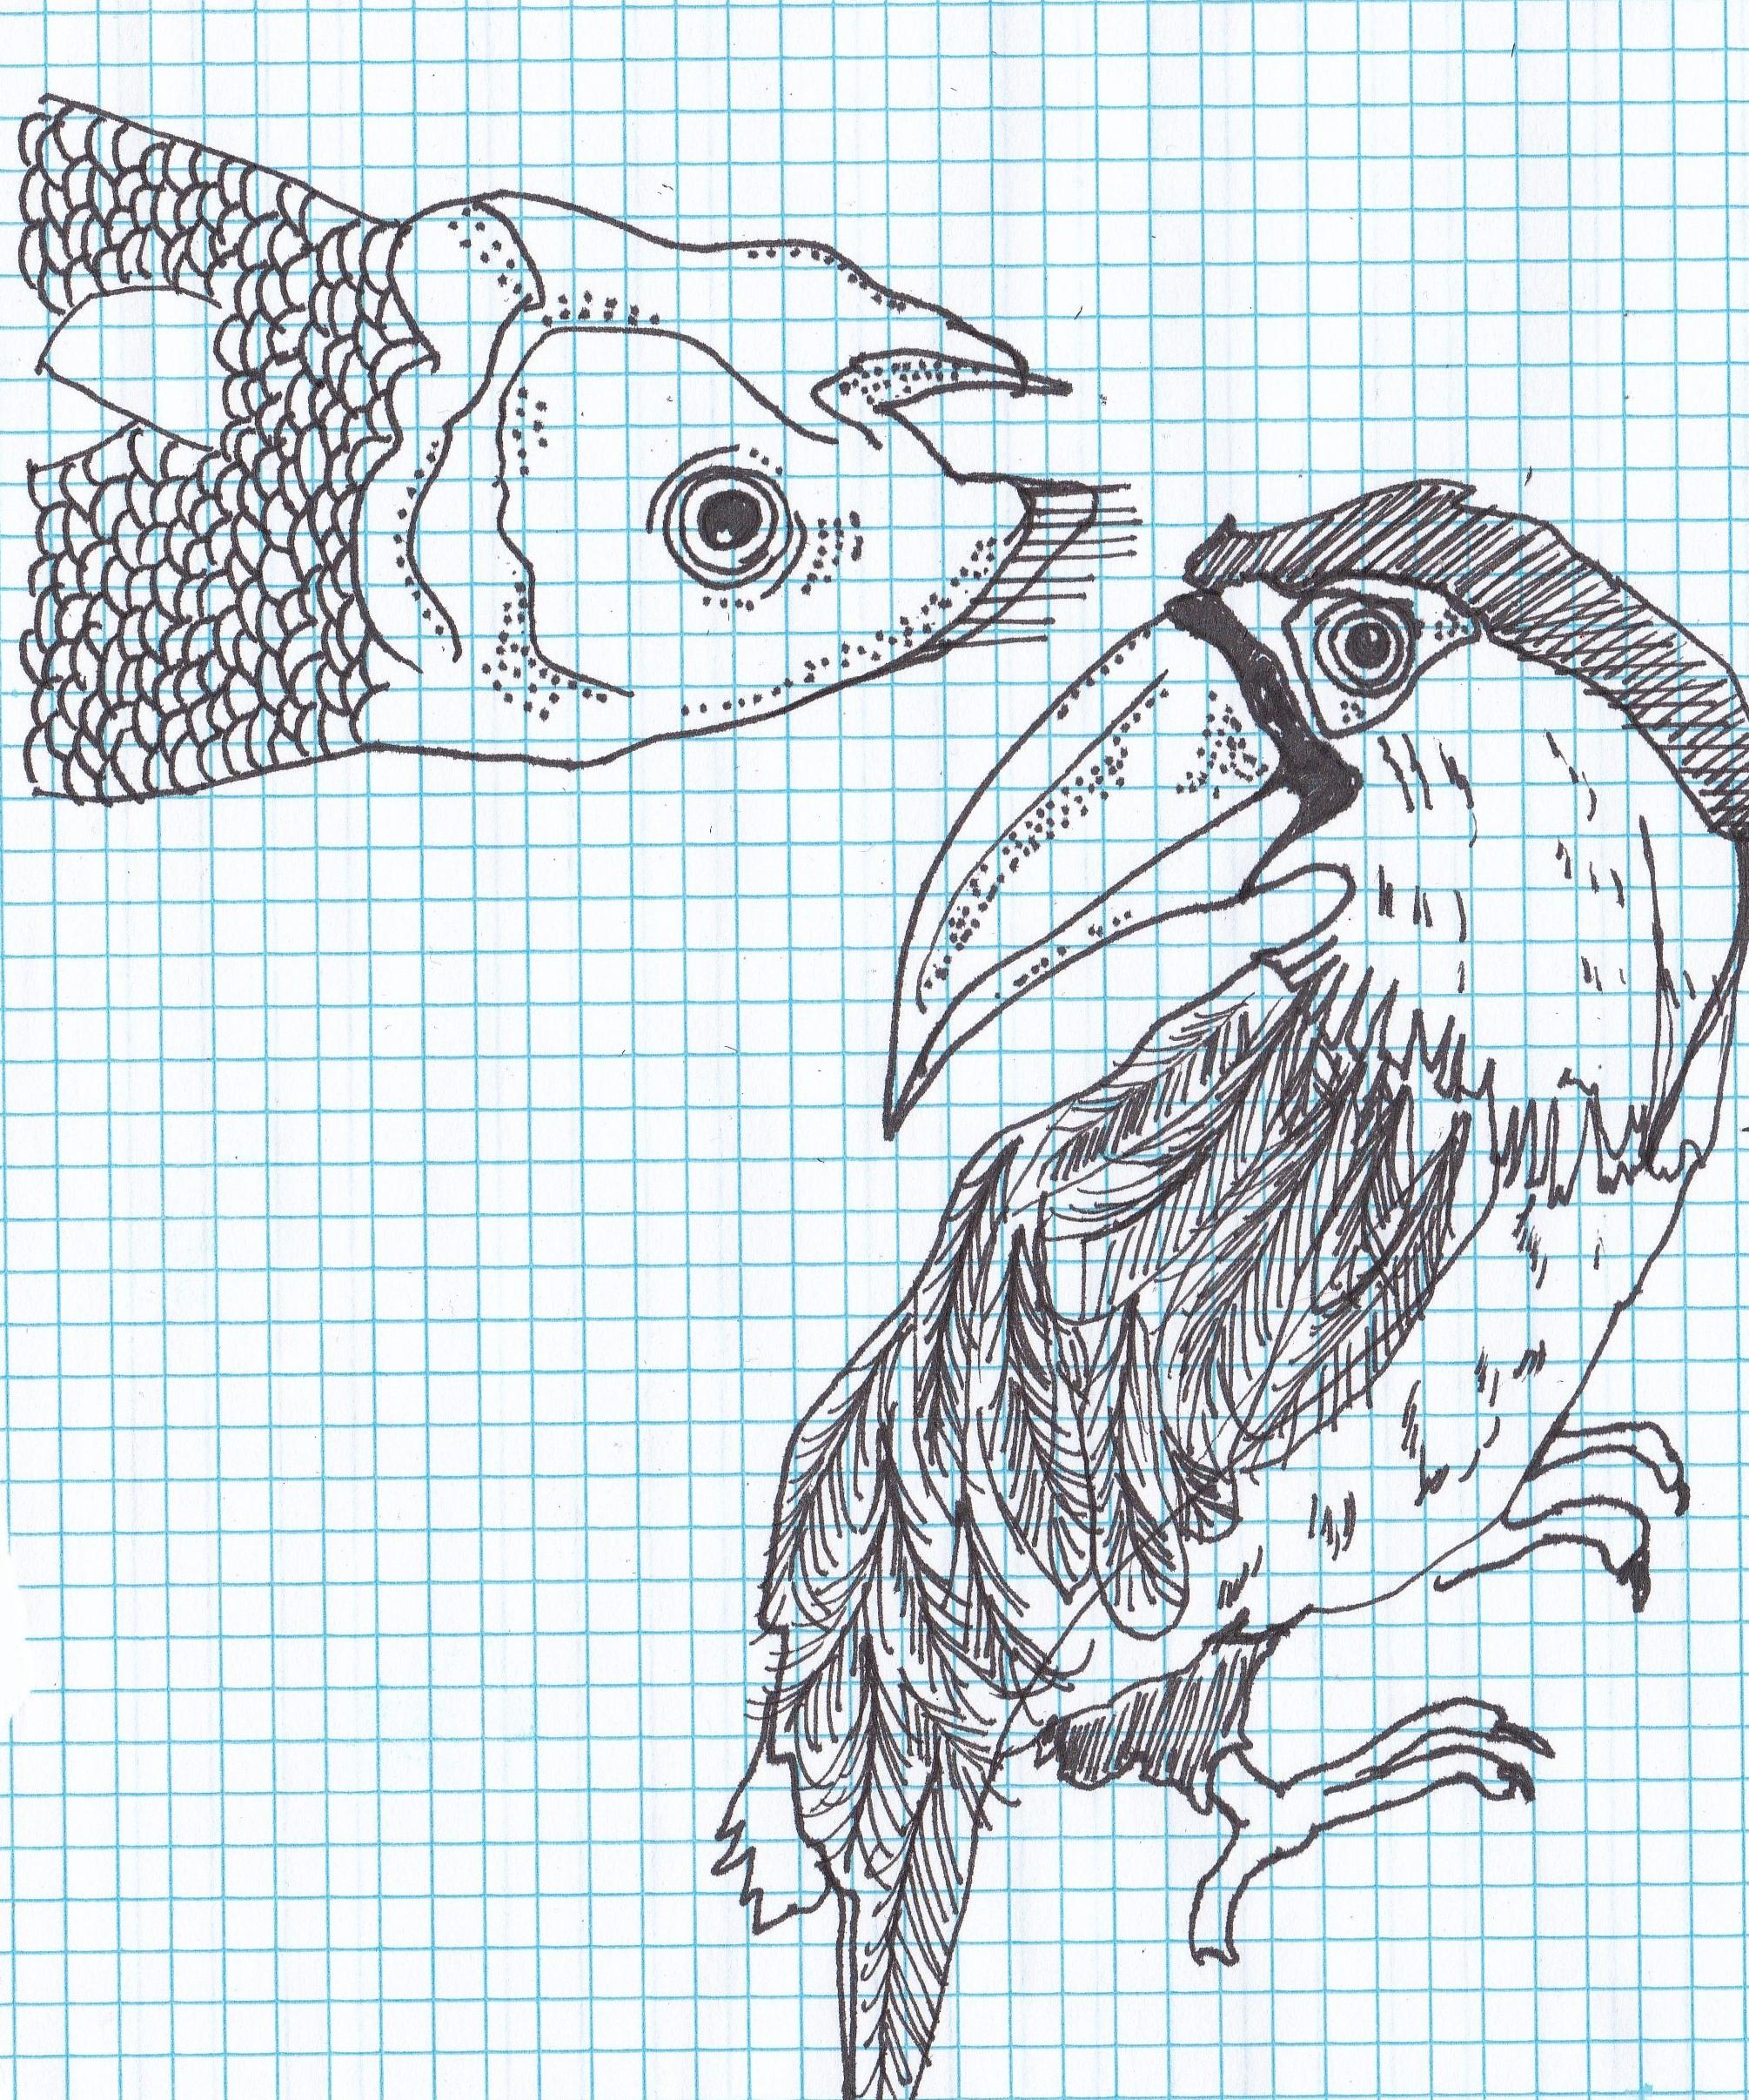 ANIMAL 26.jpg